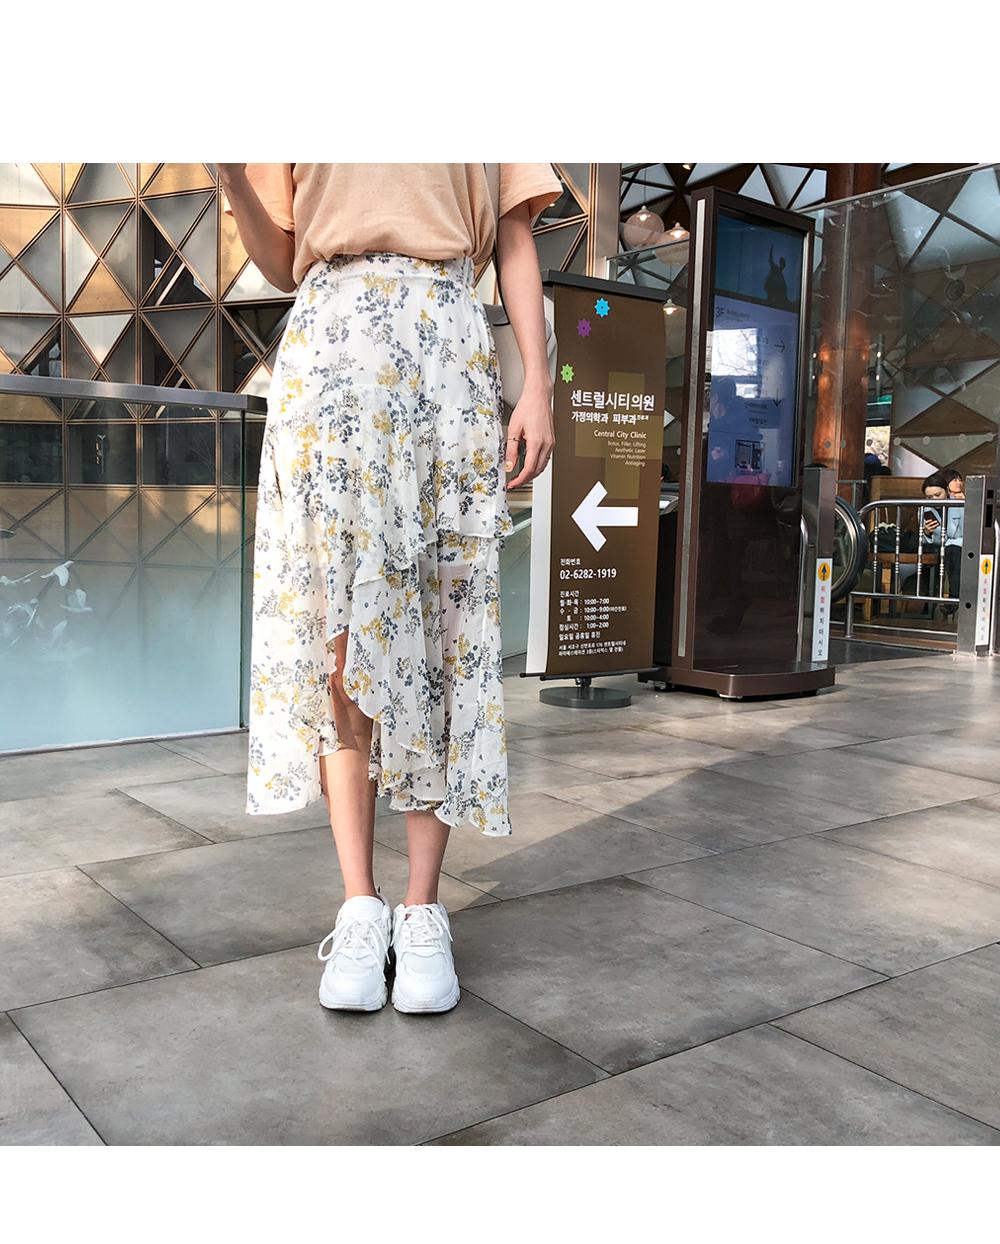 Shalala's skirt